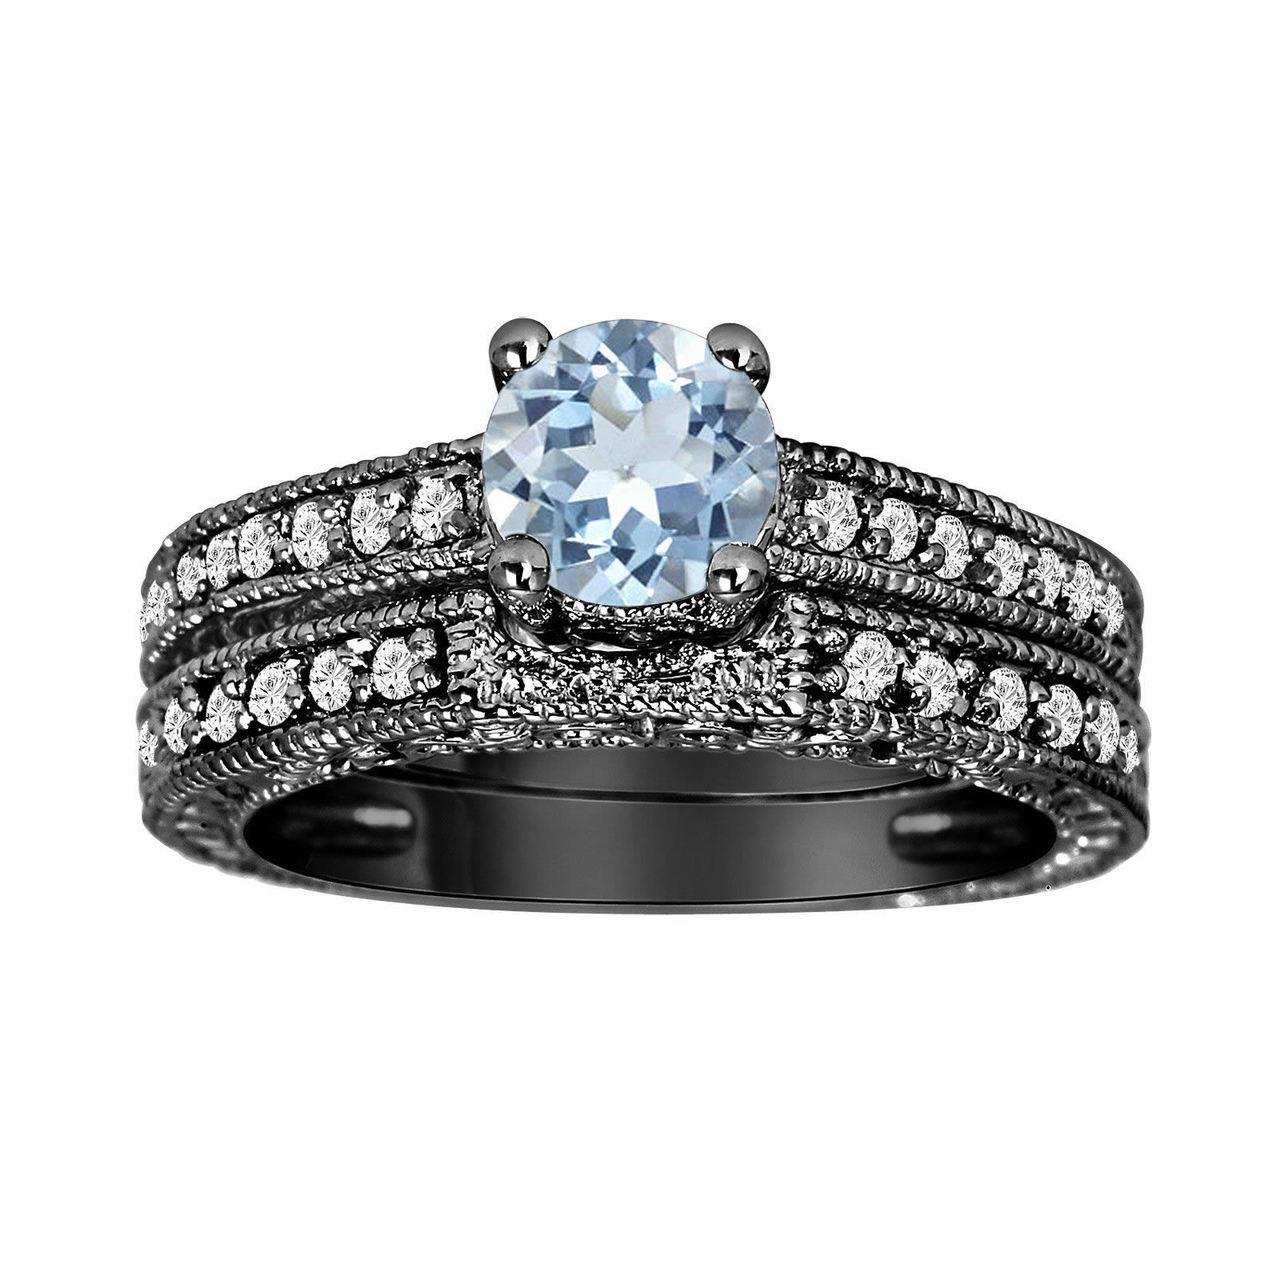 953e1557a Aquamarine & Diamond Engagement Ring And Wedding Anniversary ...